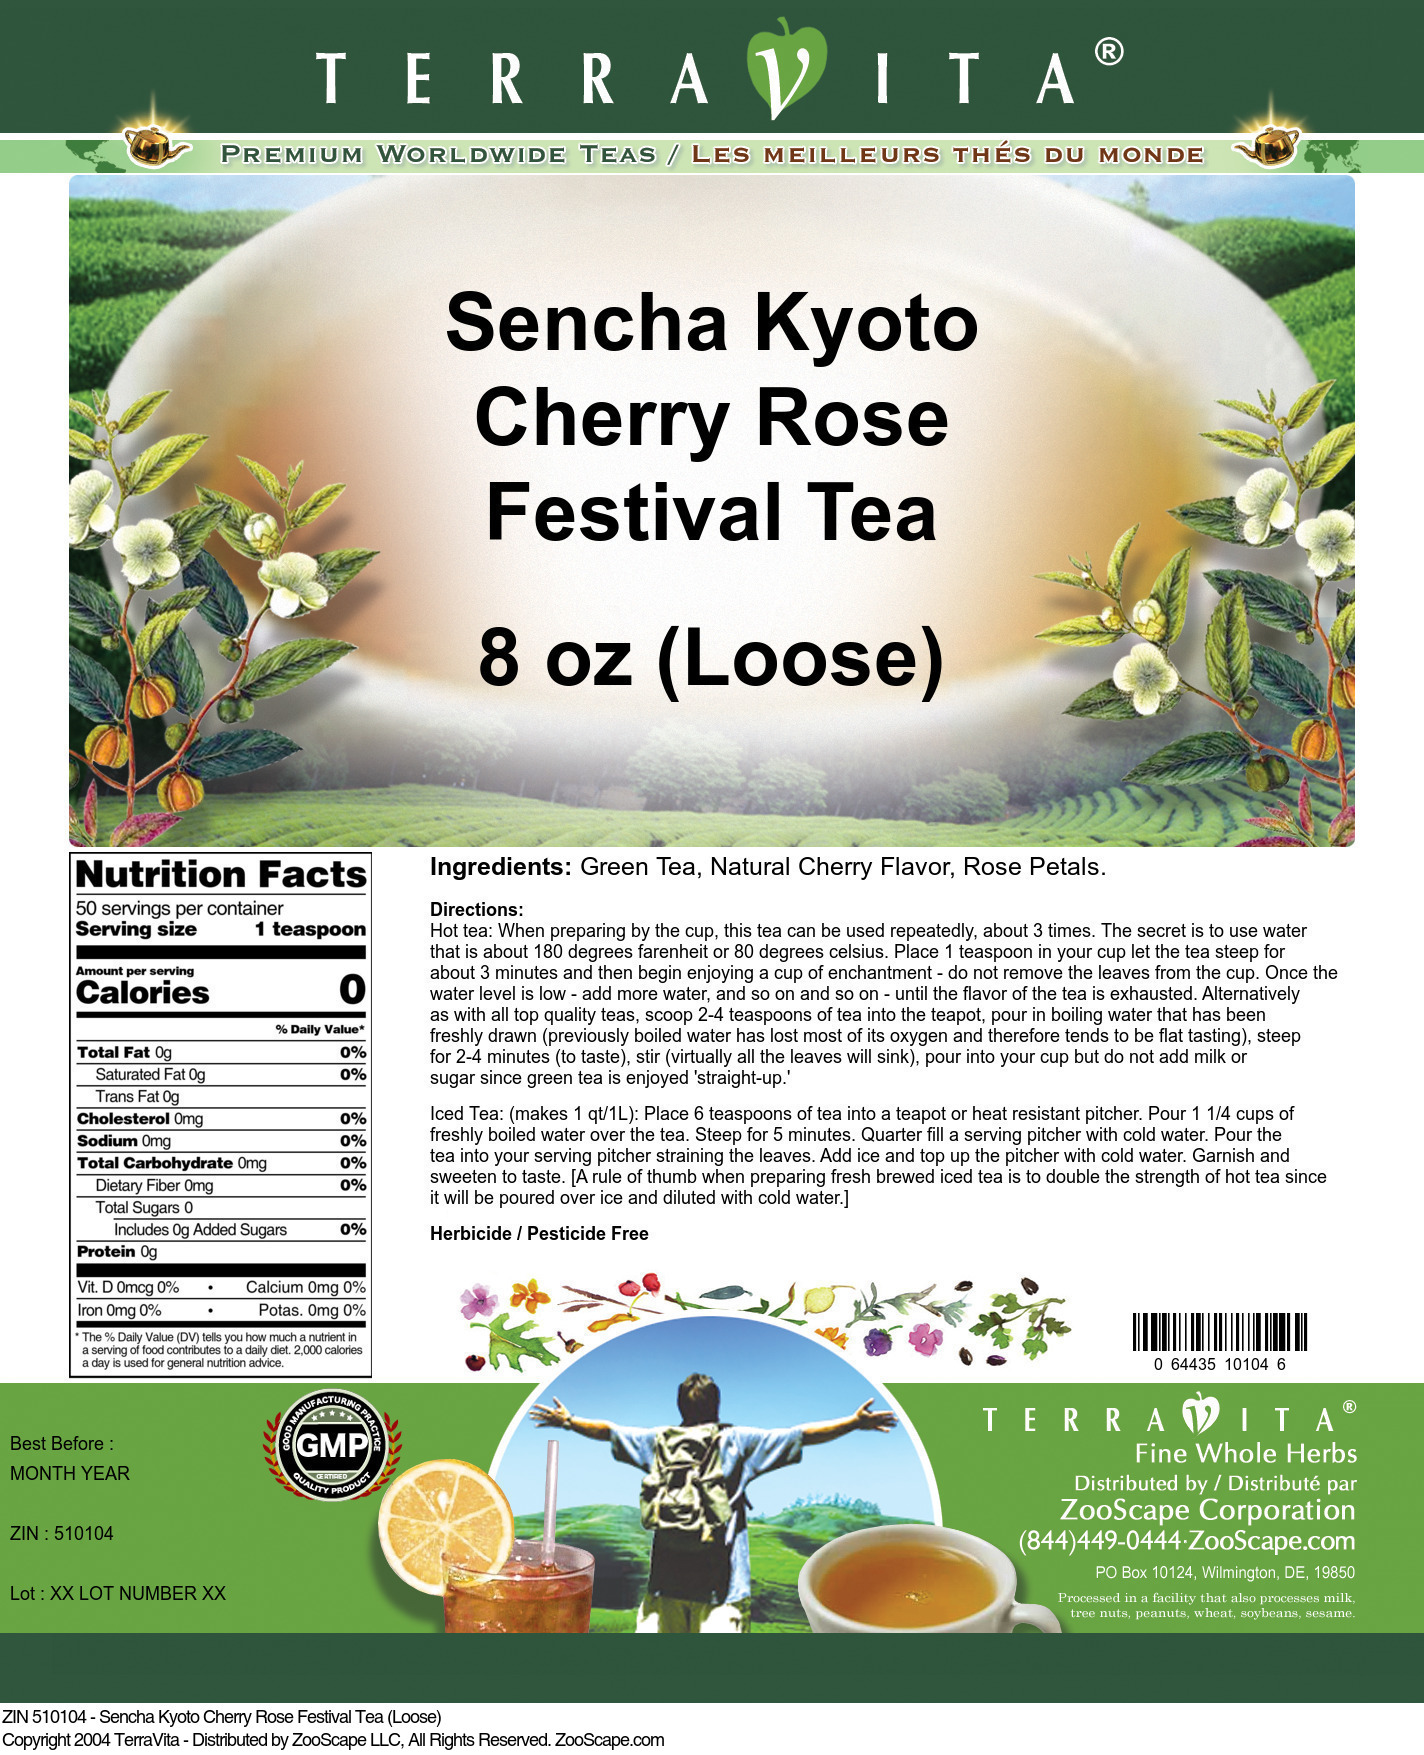 Sencha Kyoto Cherry Rose Festival